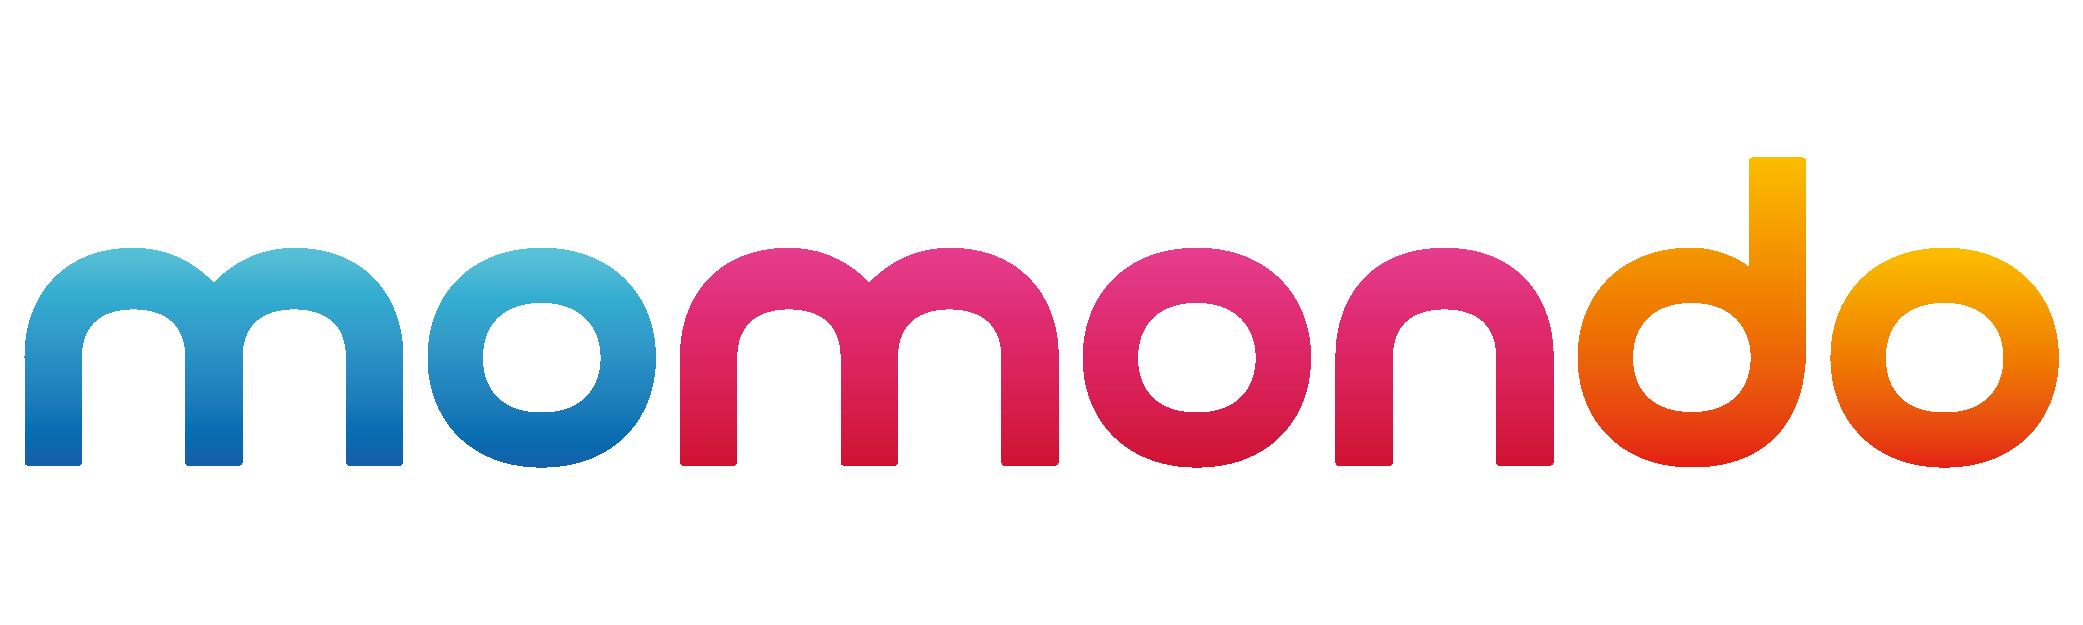 Alle 3 momondo kortingscodes geldig in mei 2019